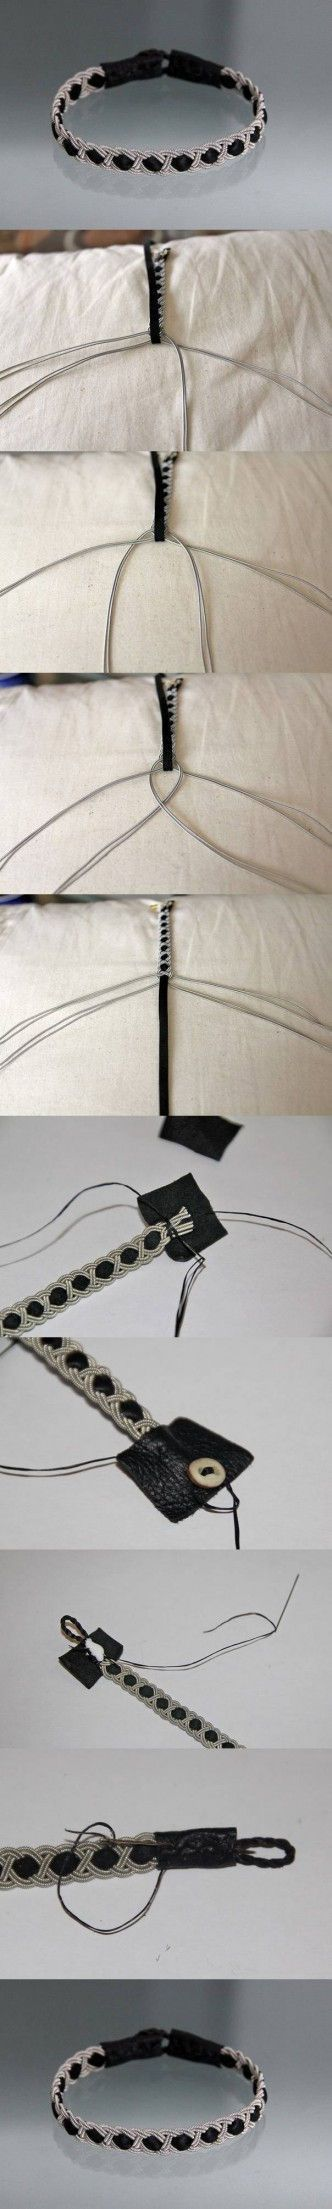 DIY Cute Wristband